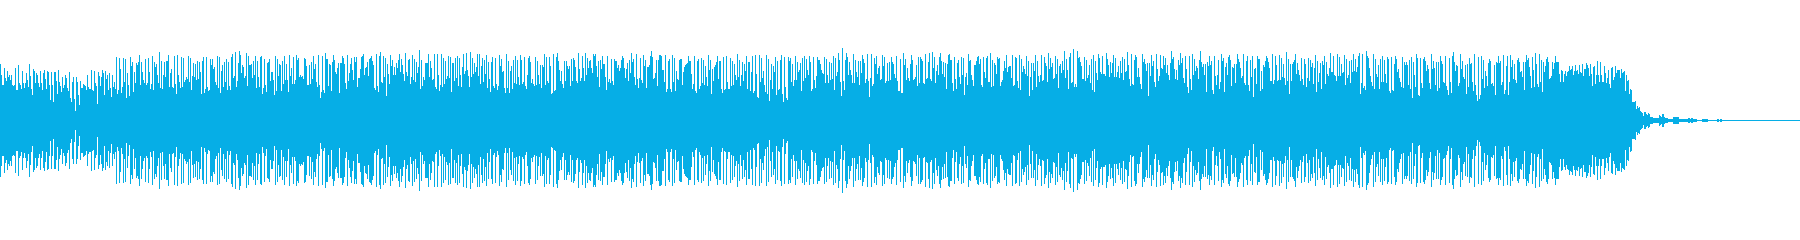 KANTアンビエント神秘200615の再生済みの波形